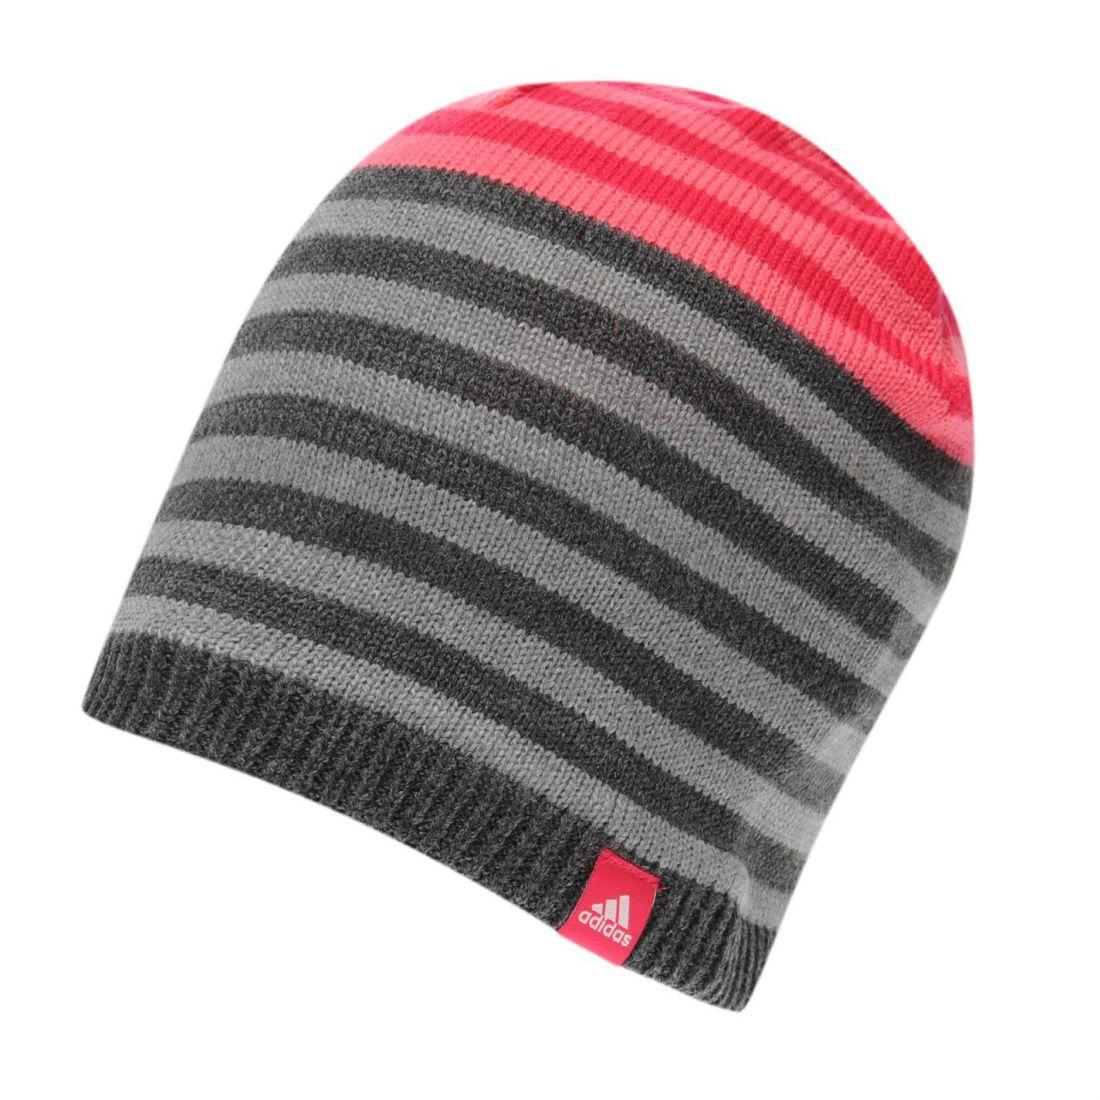 eb9fedac31c8c adidas Kids Stripe Beanie Juniors Warm Striped Knitted